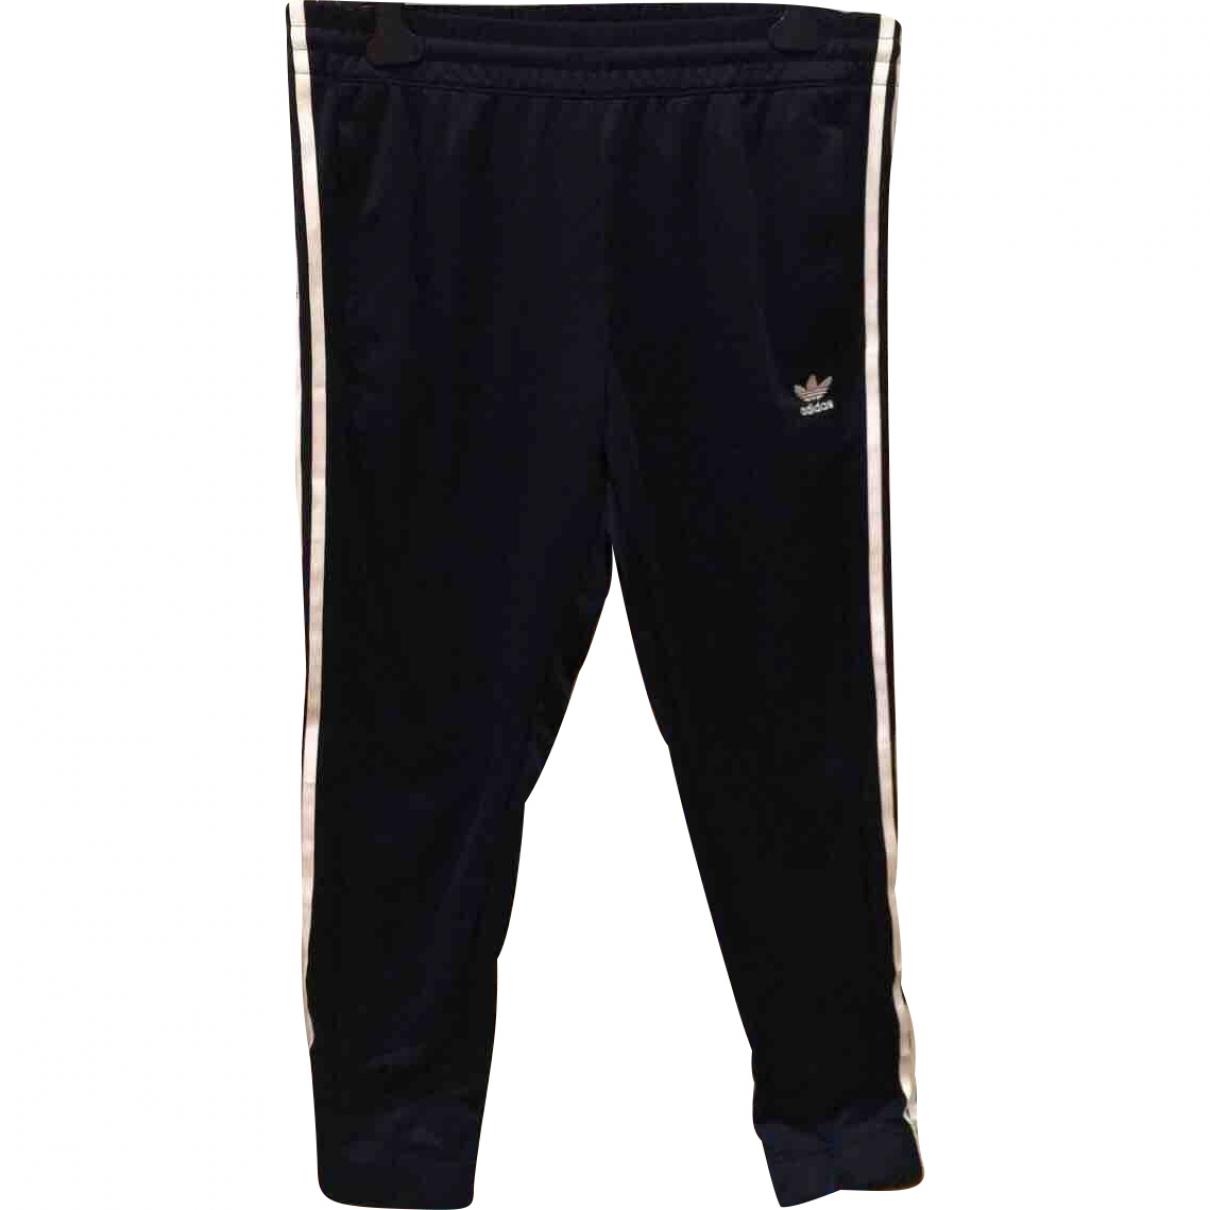 Adidas \N Blue Cotton Trousers for Men L International